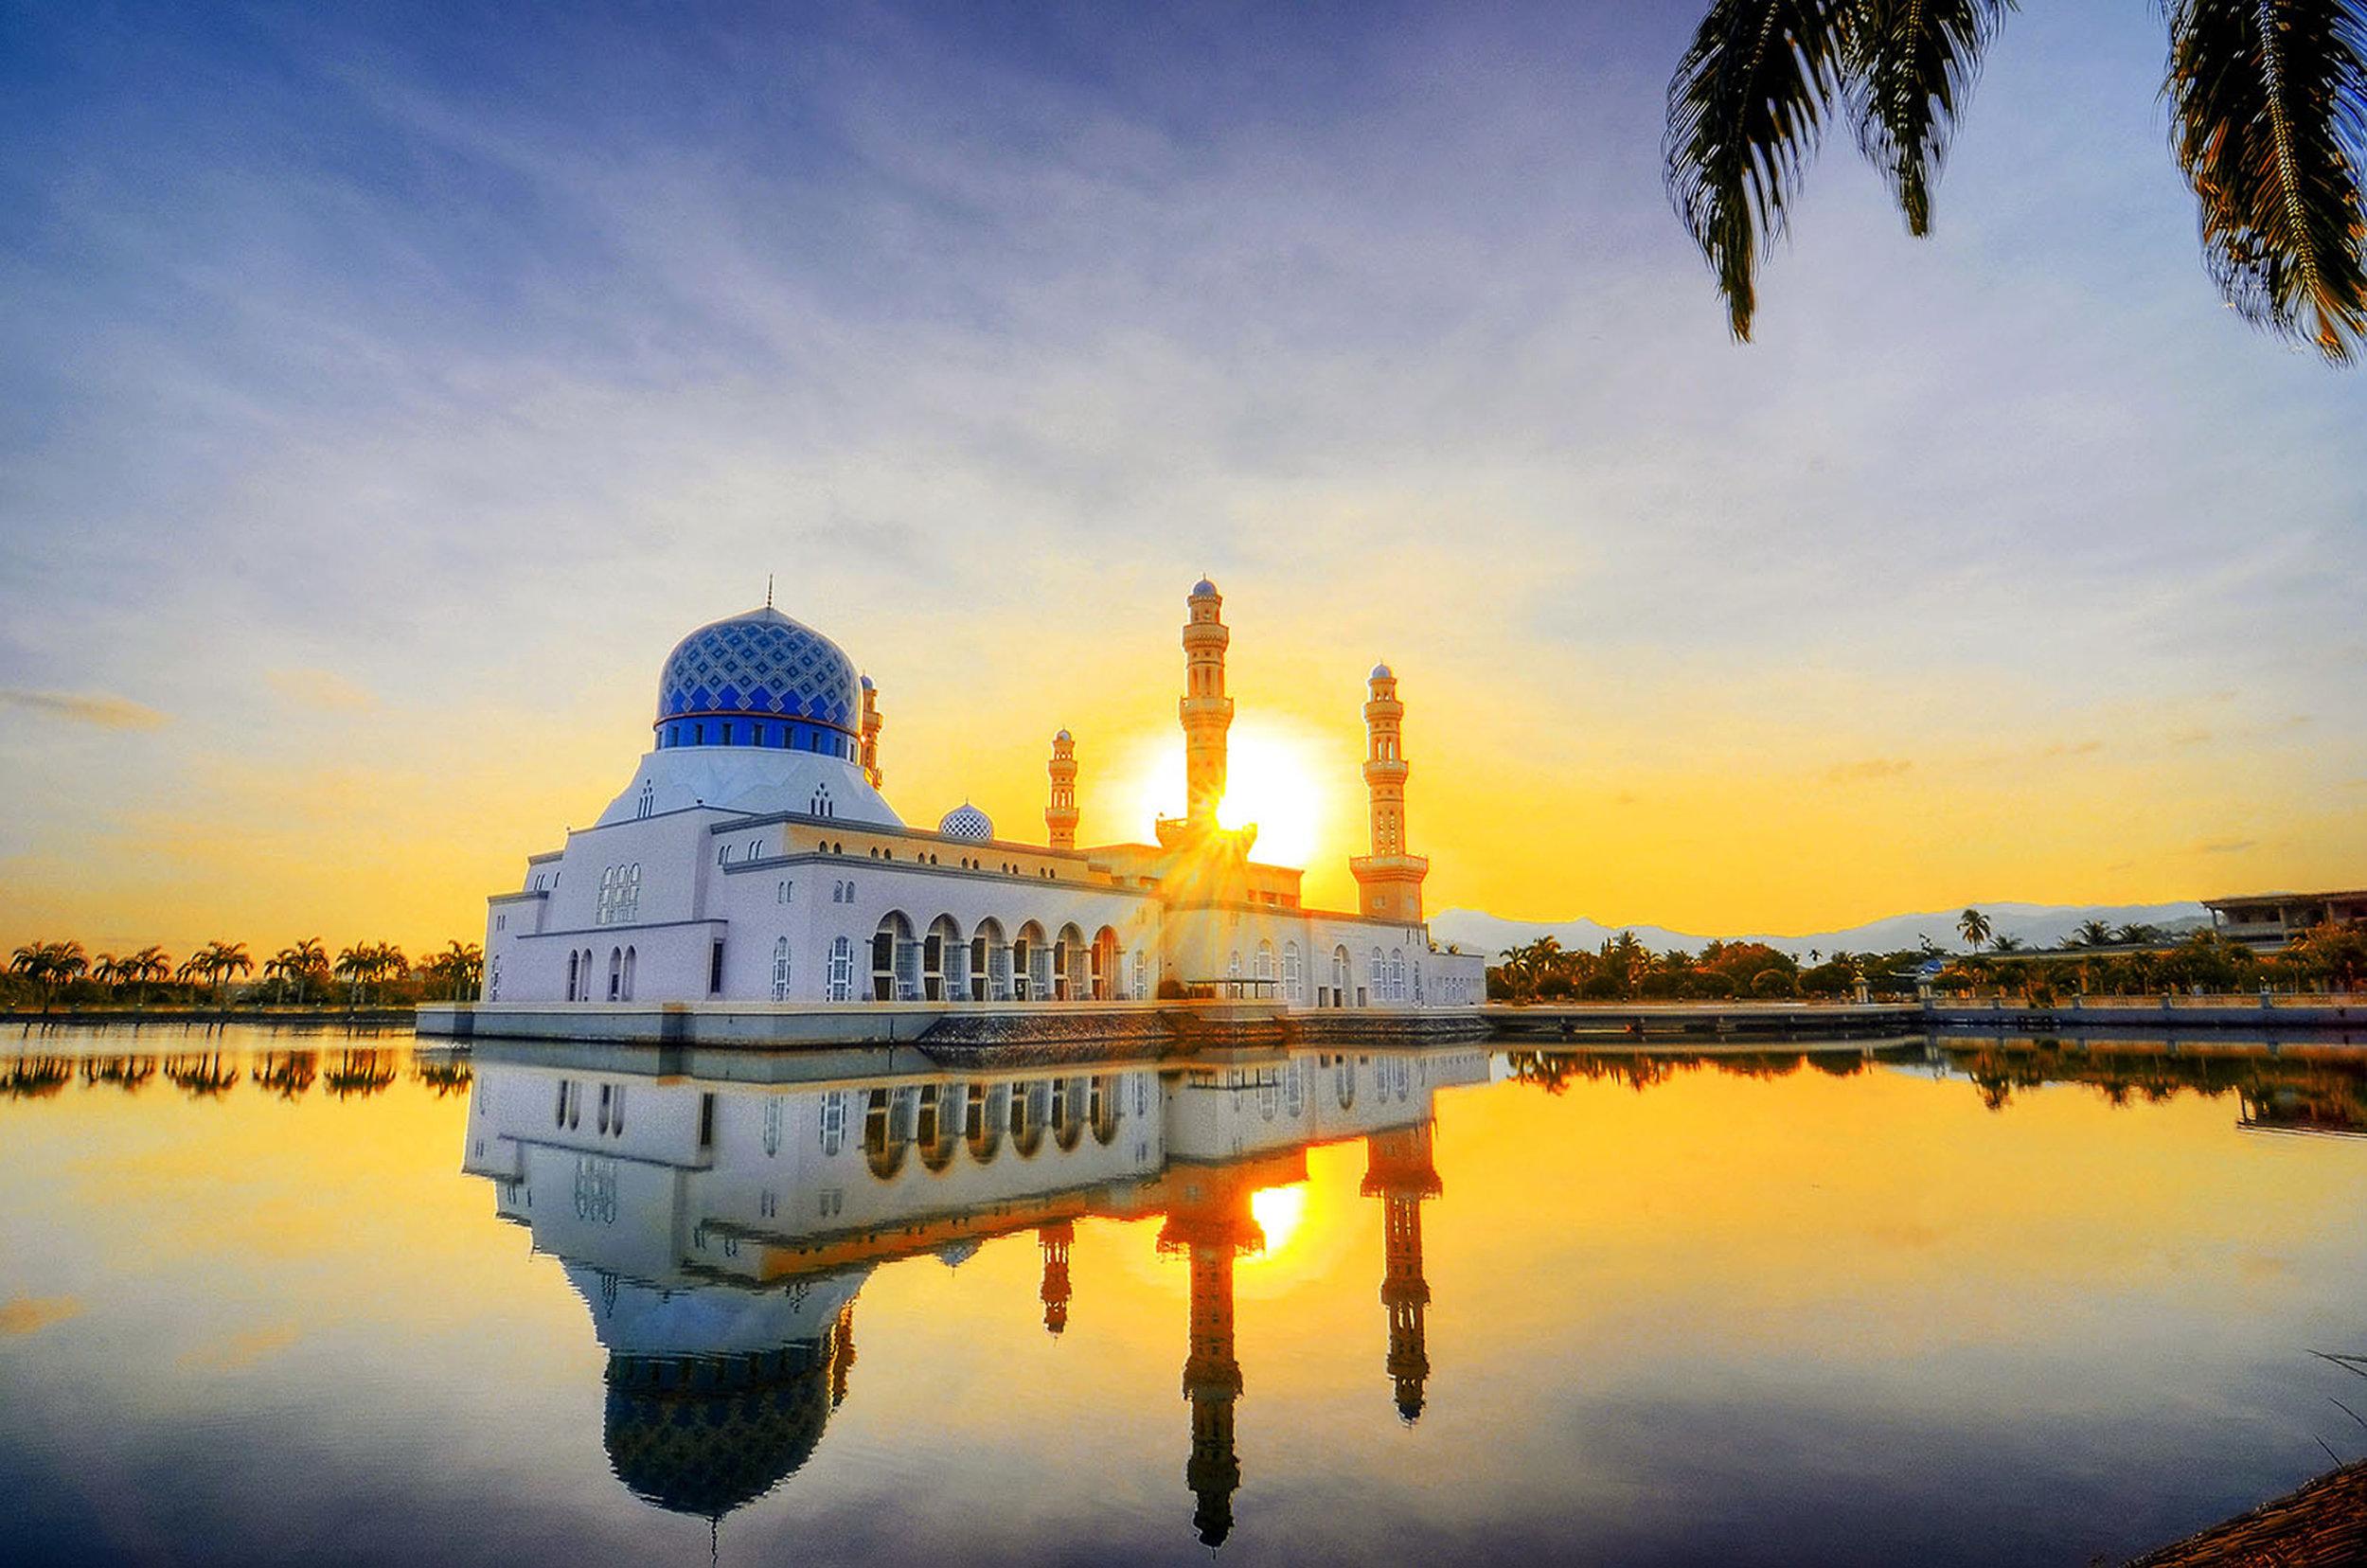 The impressive Likas Floating Mosque